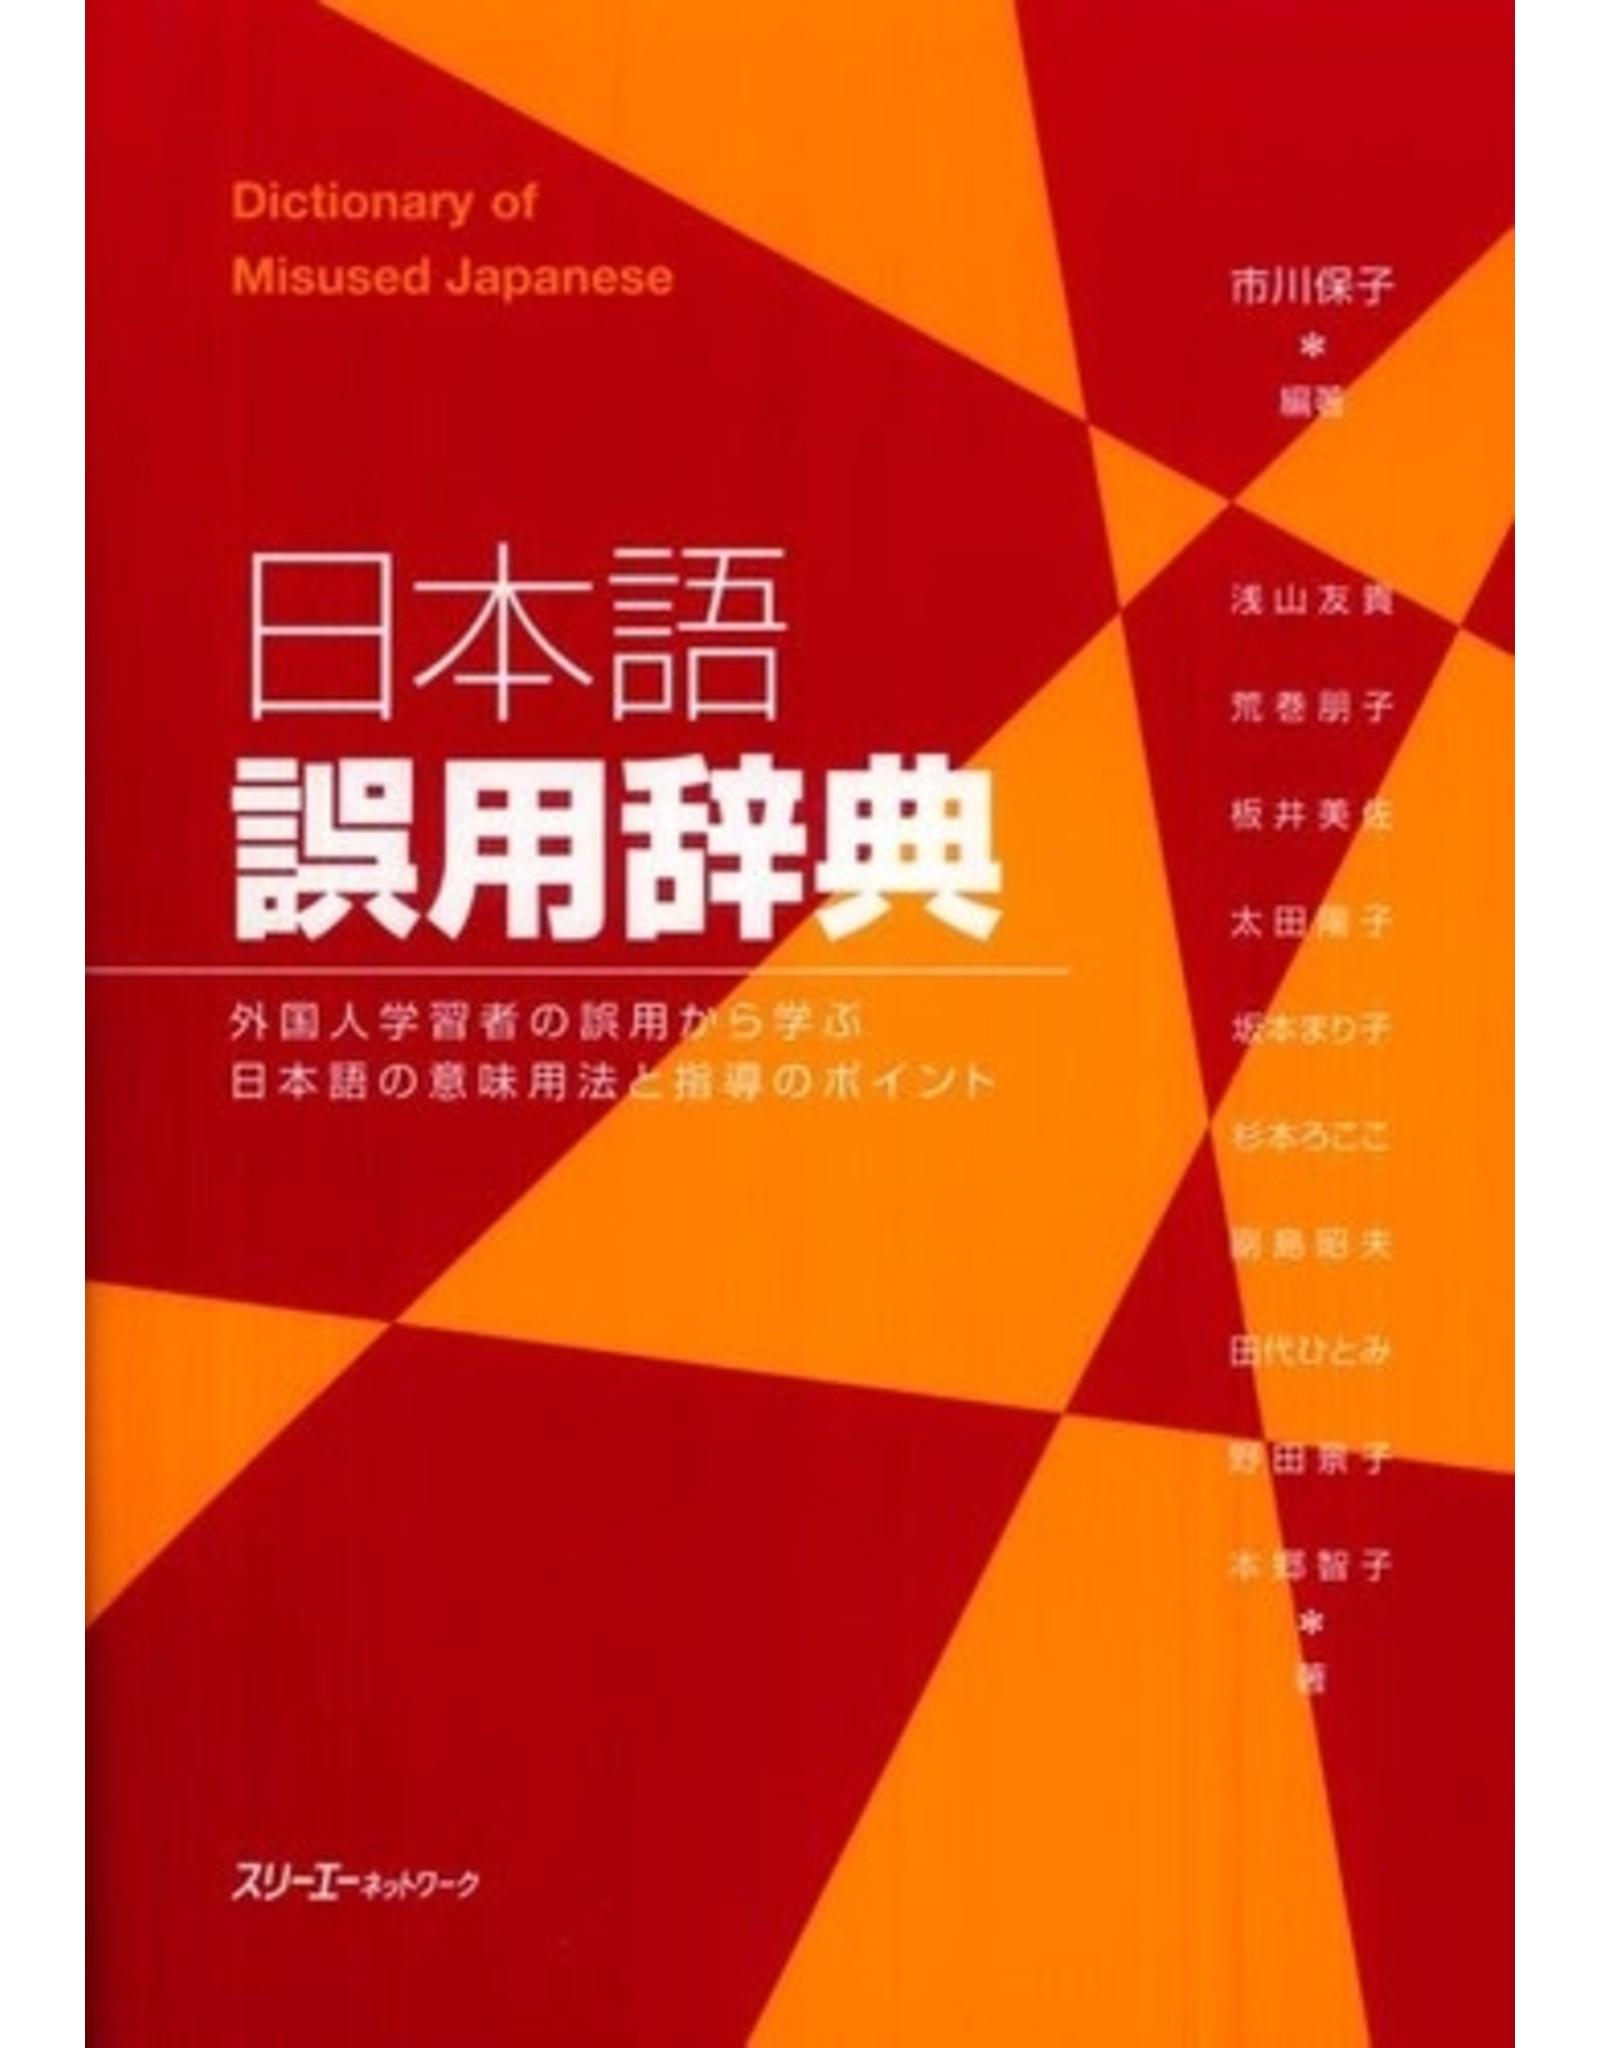 3A Corporation DICTIONARY OF MISUSED JAPANESE NIHONGO GOYO JITEN